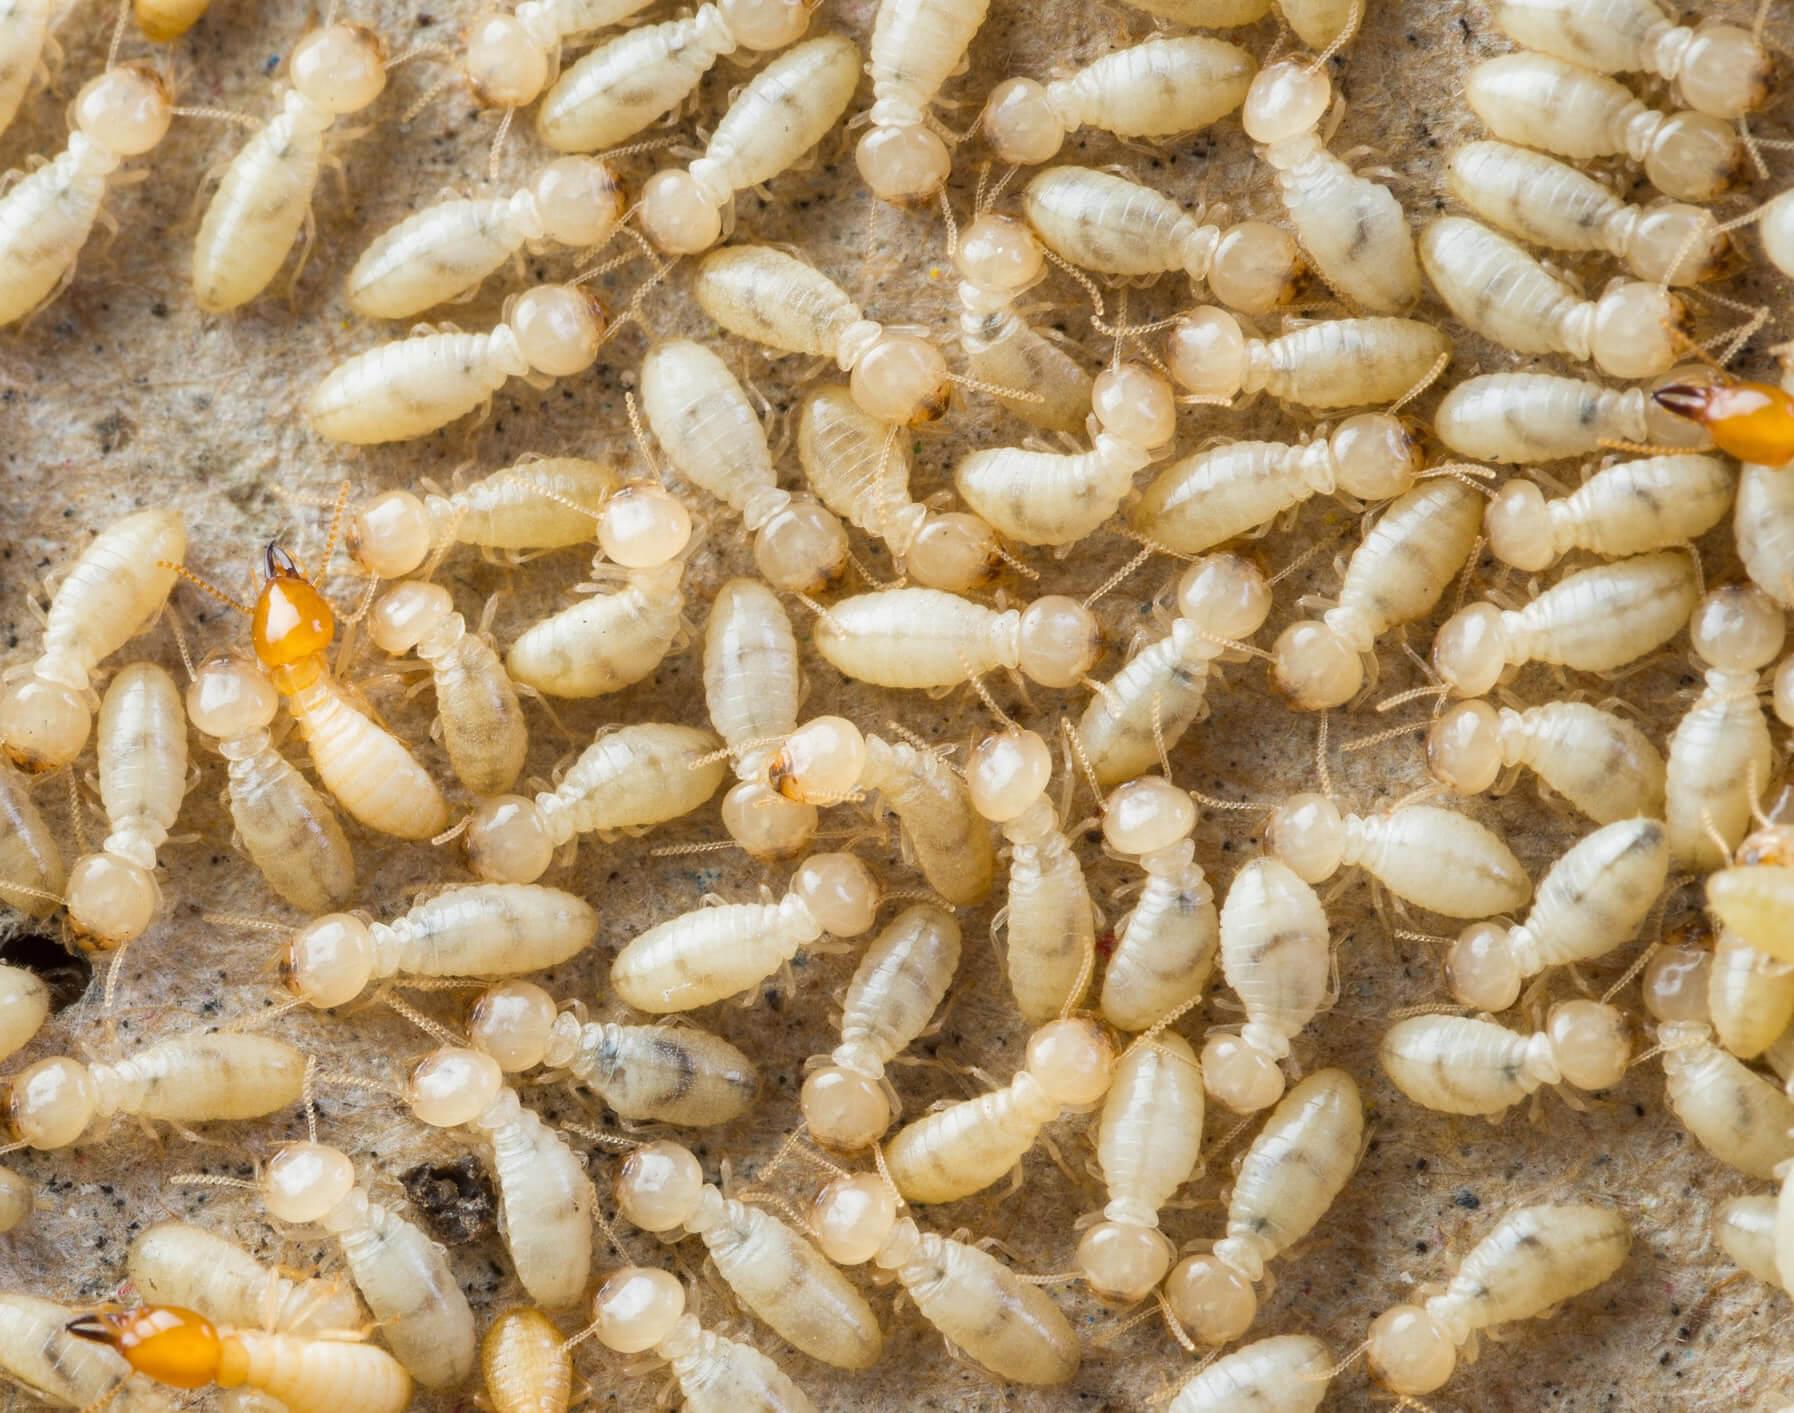 termite control gold coast image 33